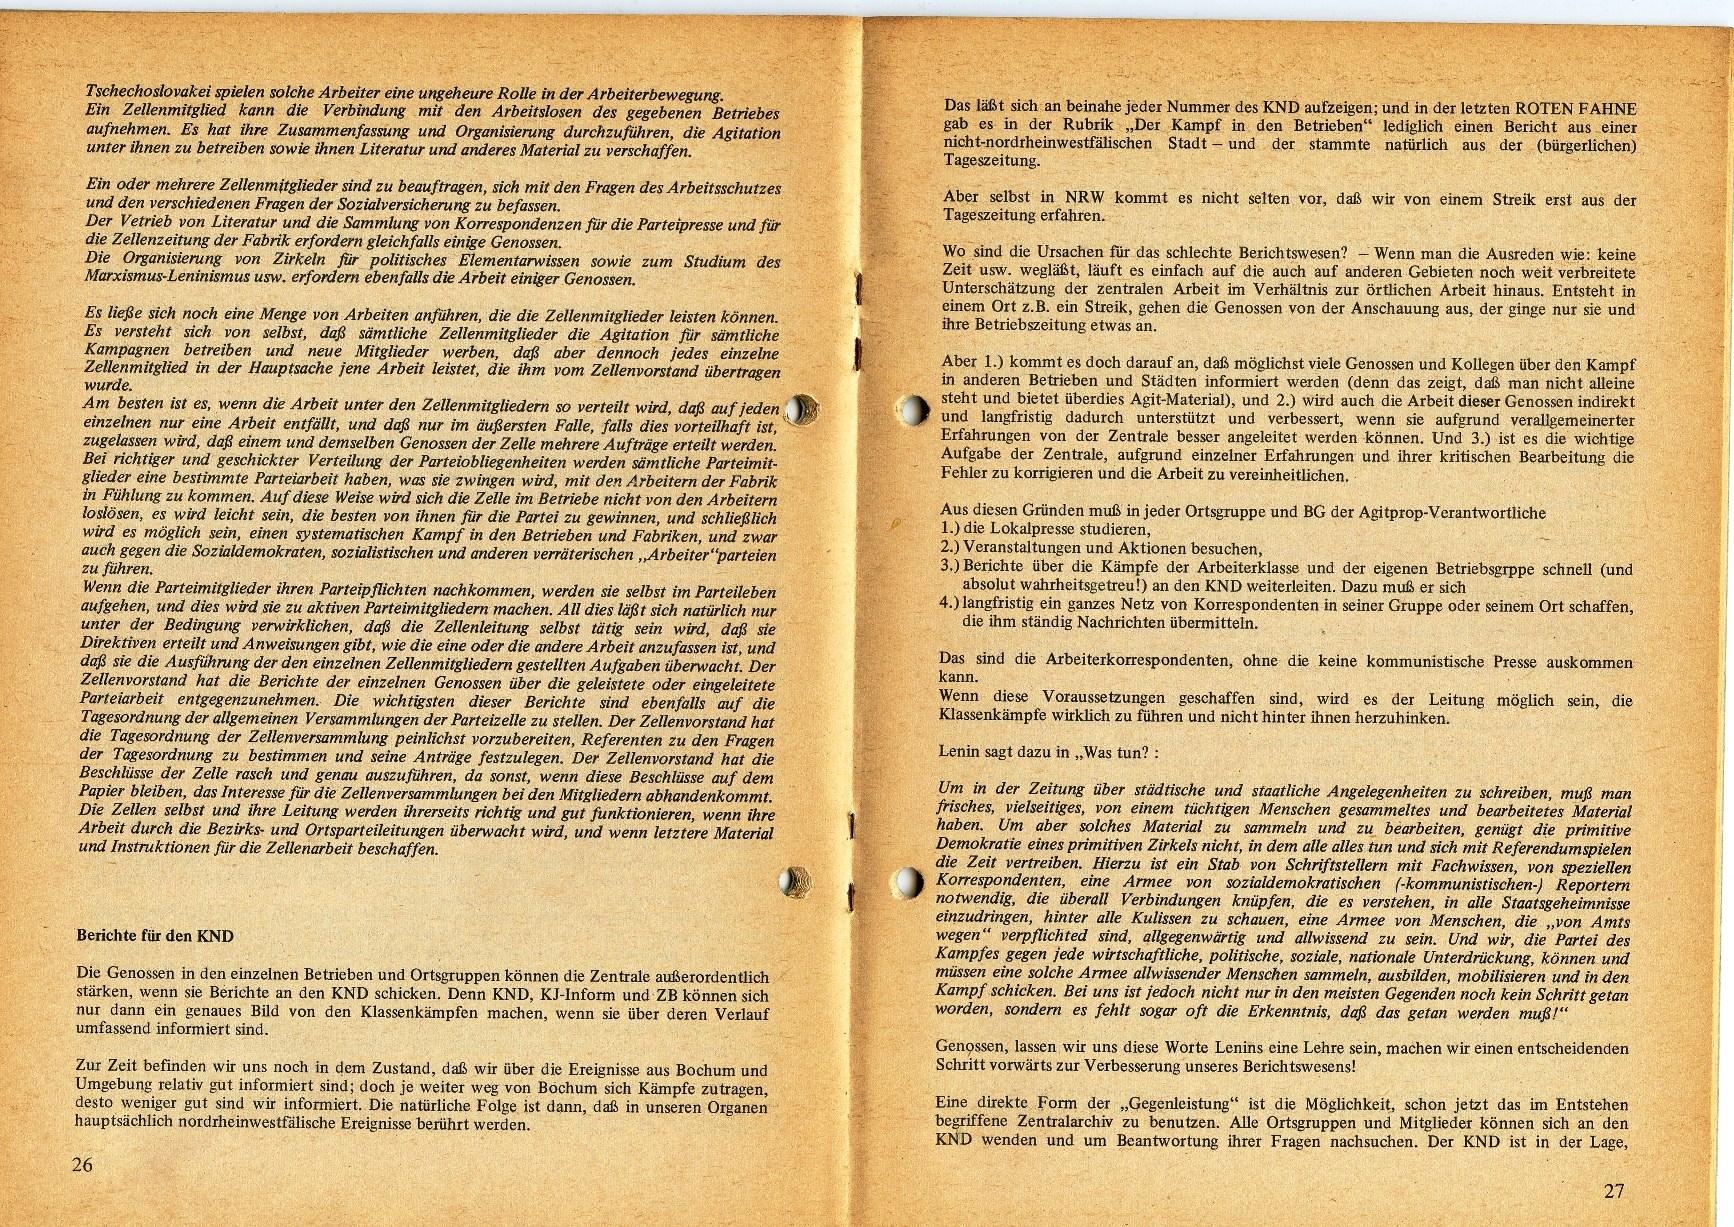 ZB_Parteiarbeiter_1970_02_15